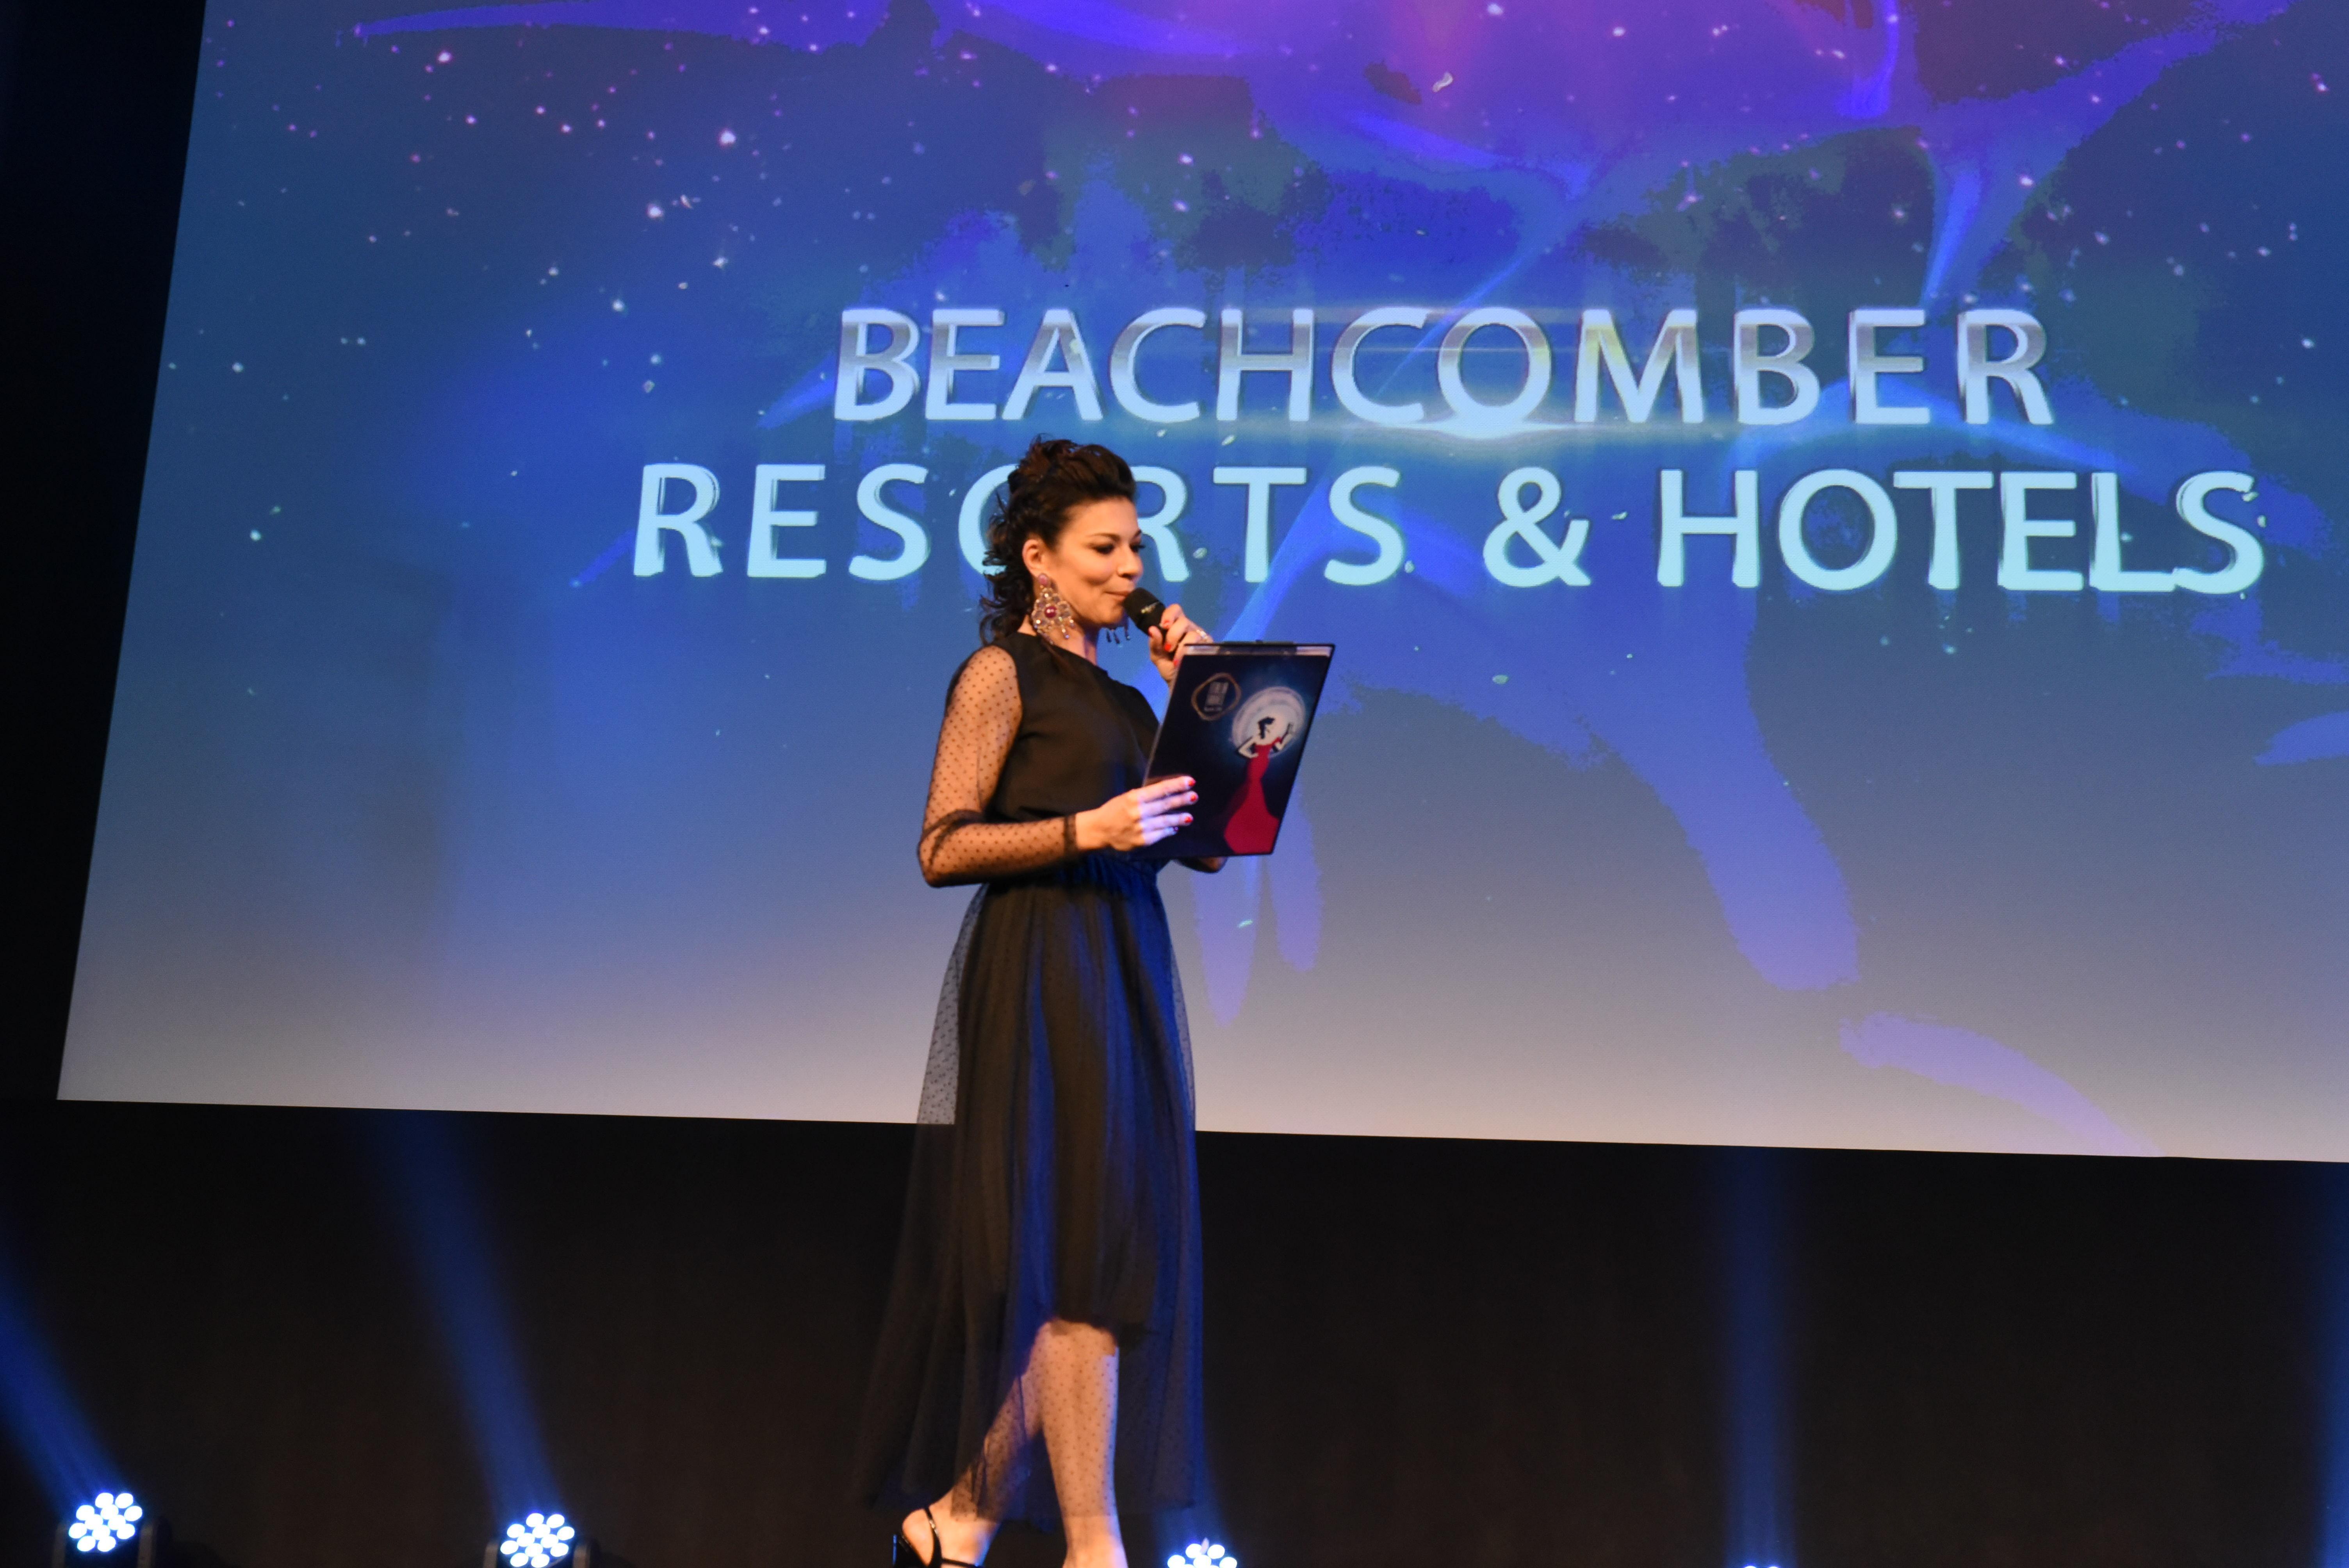 Italia Travel Awards 2018: Beachcomber named best hotel chain